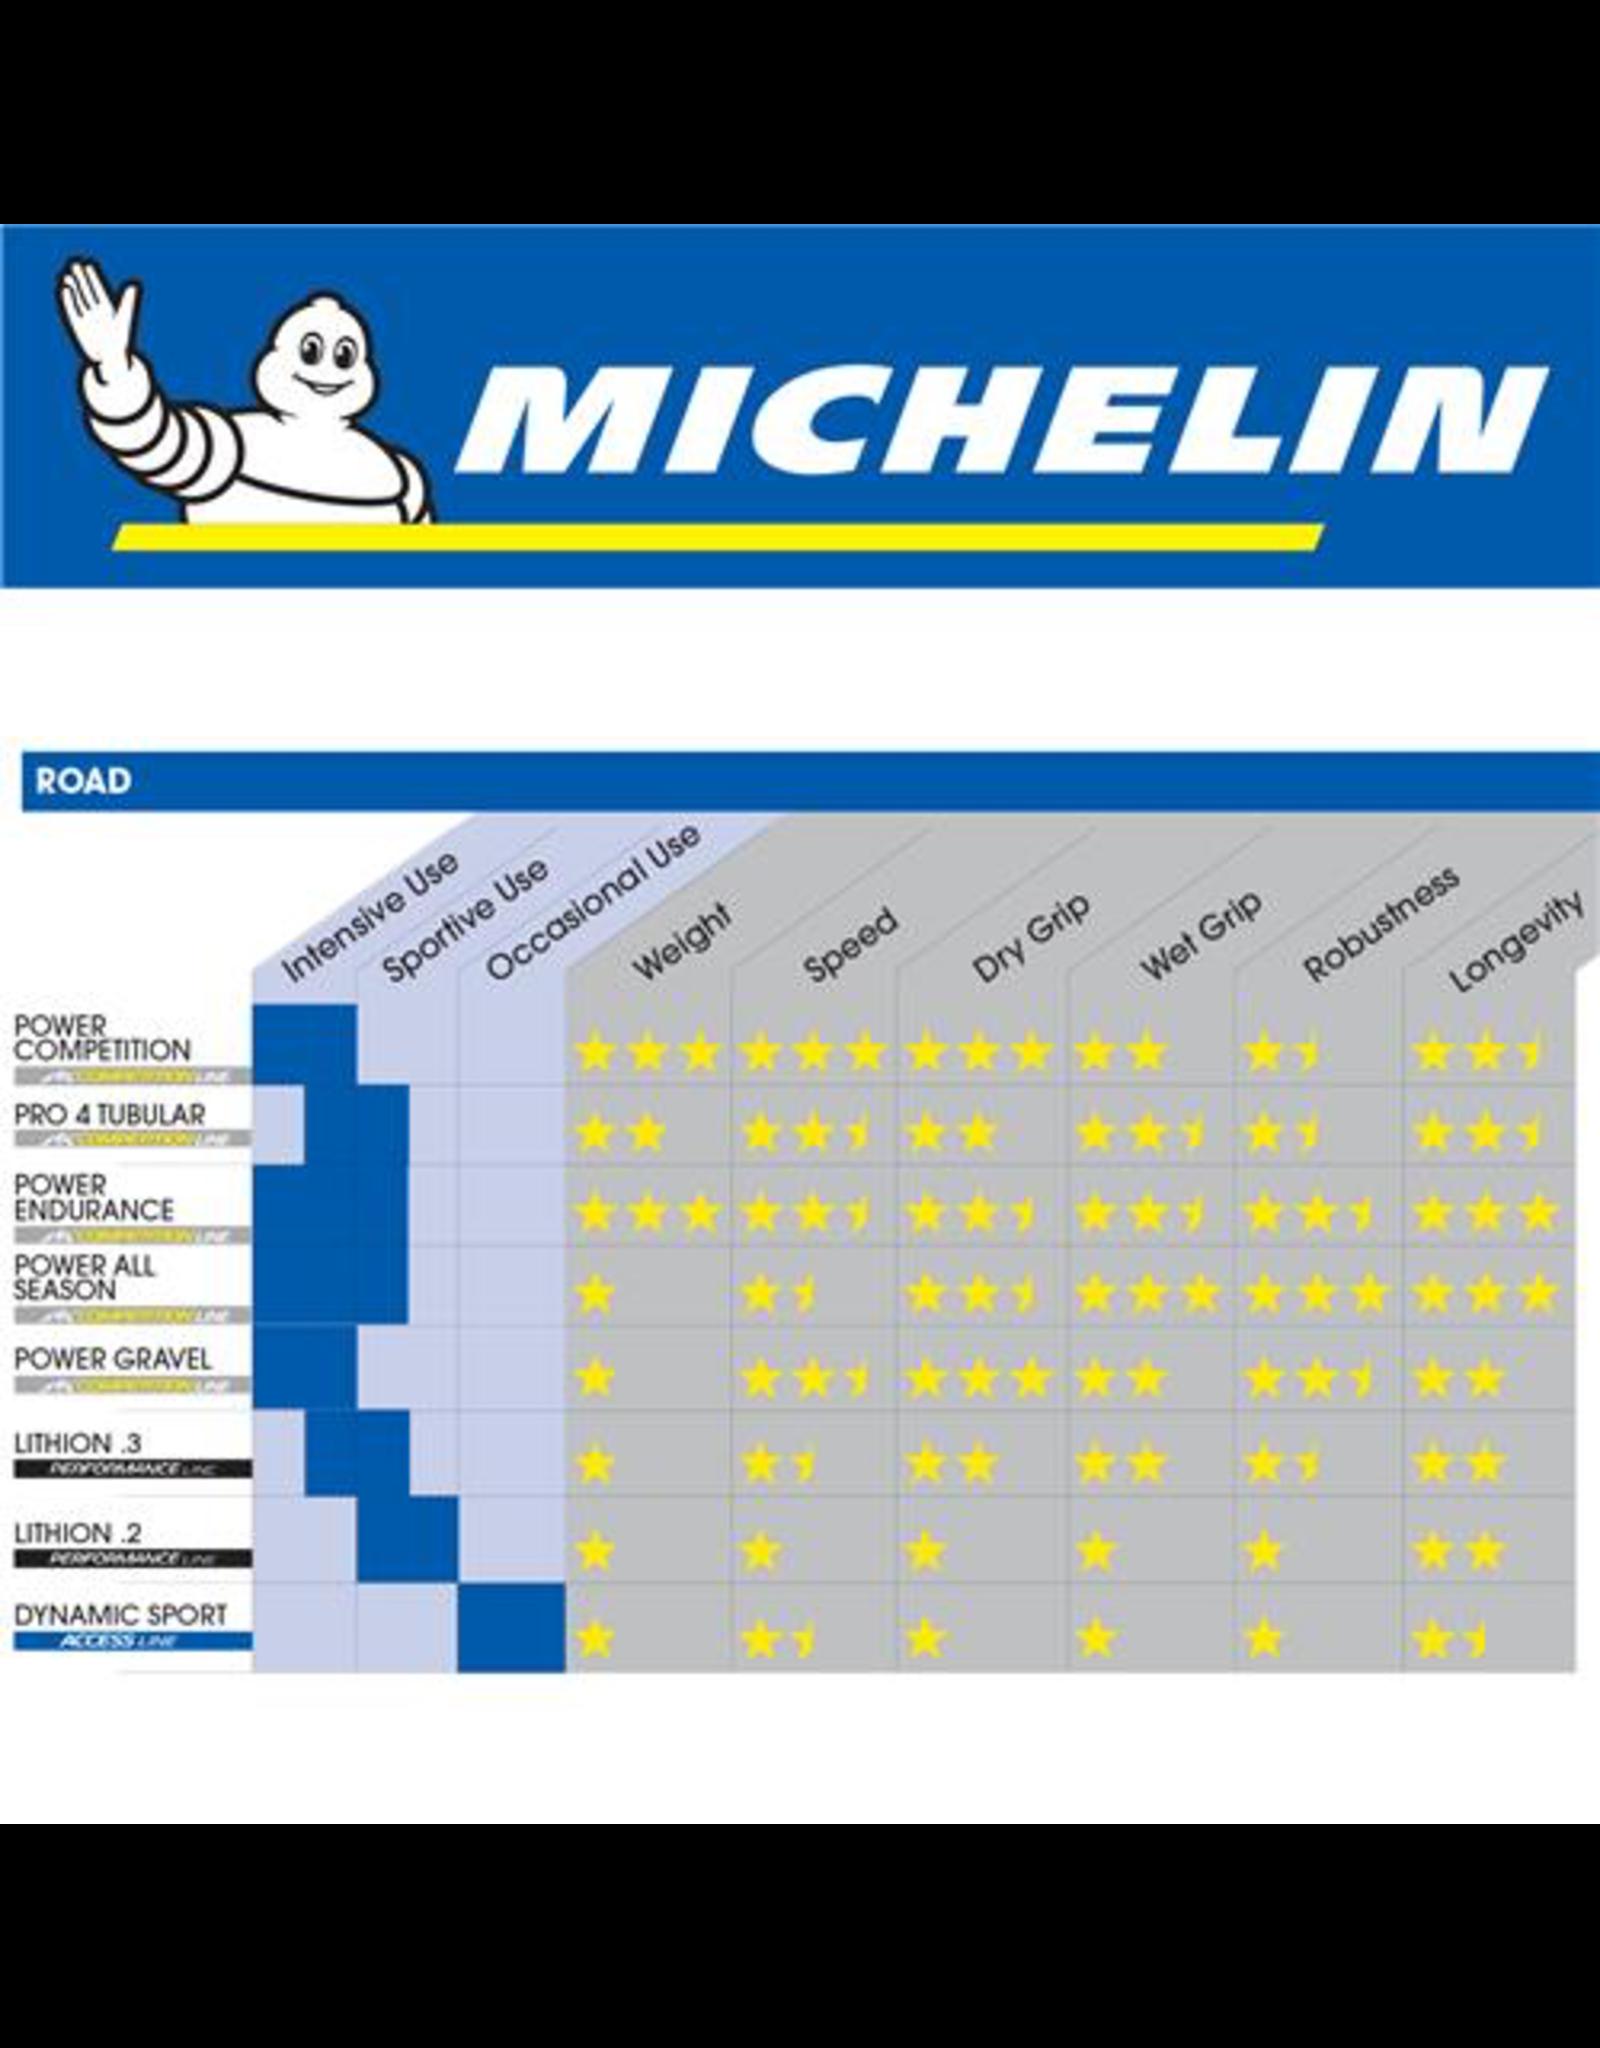 MICHELIN TYRE MICHELIN LITHION .2 PERFORMANCE 700 X 25C FOLD BLACK/GREY